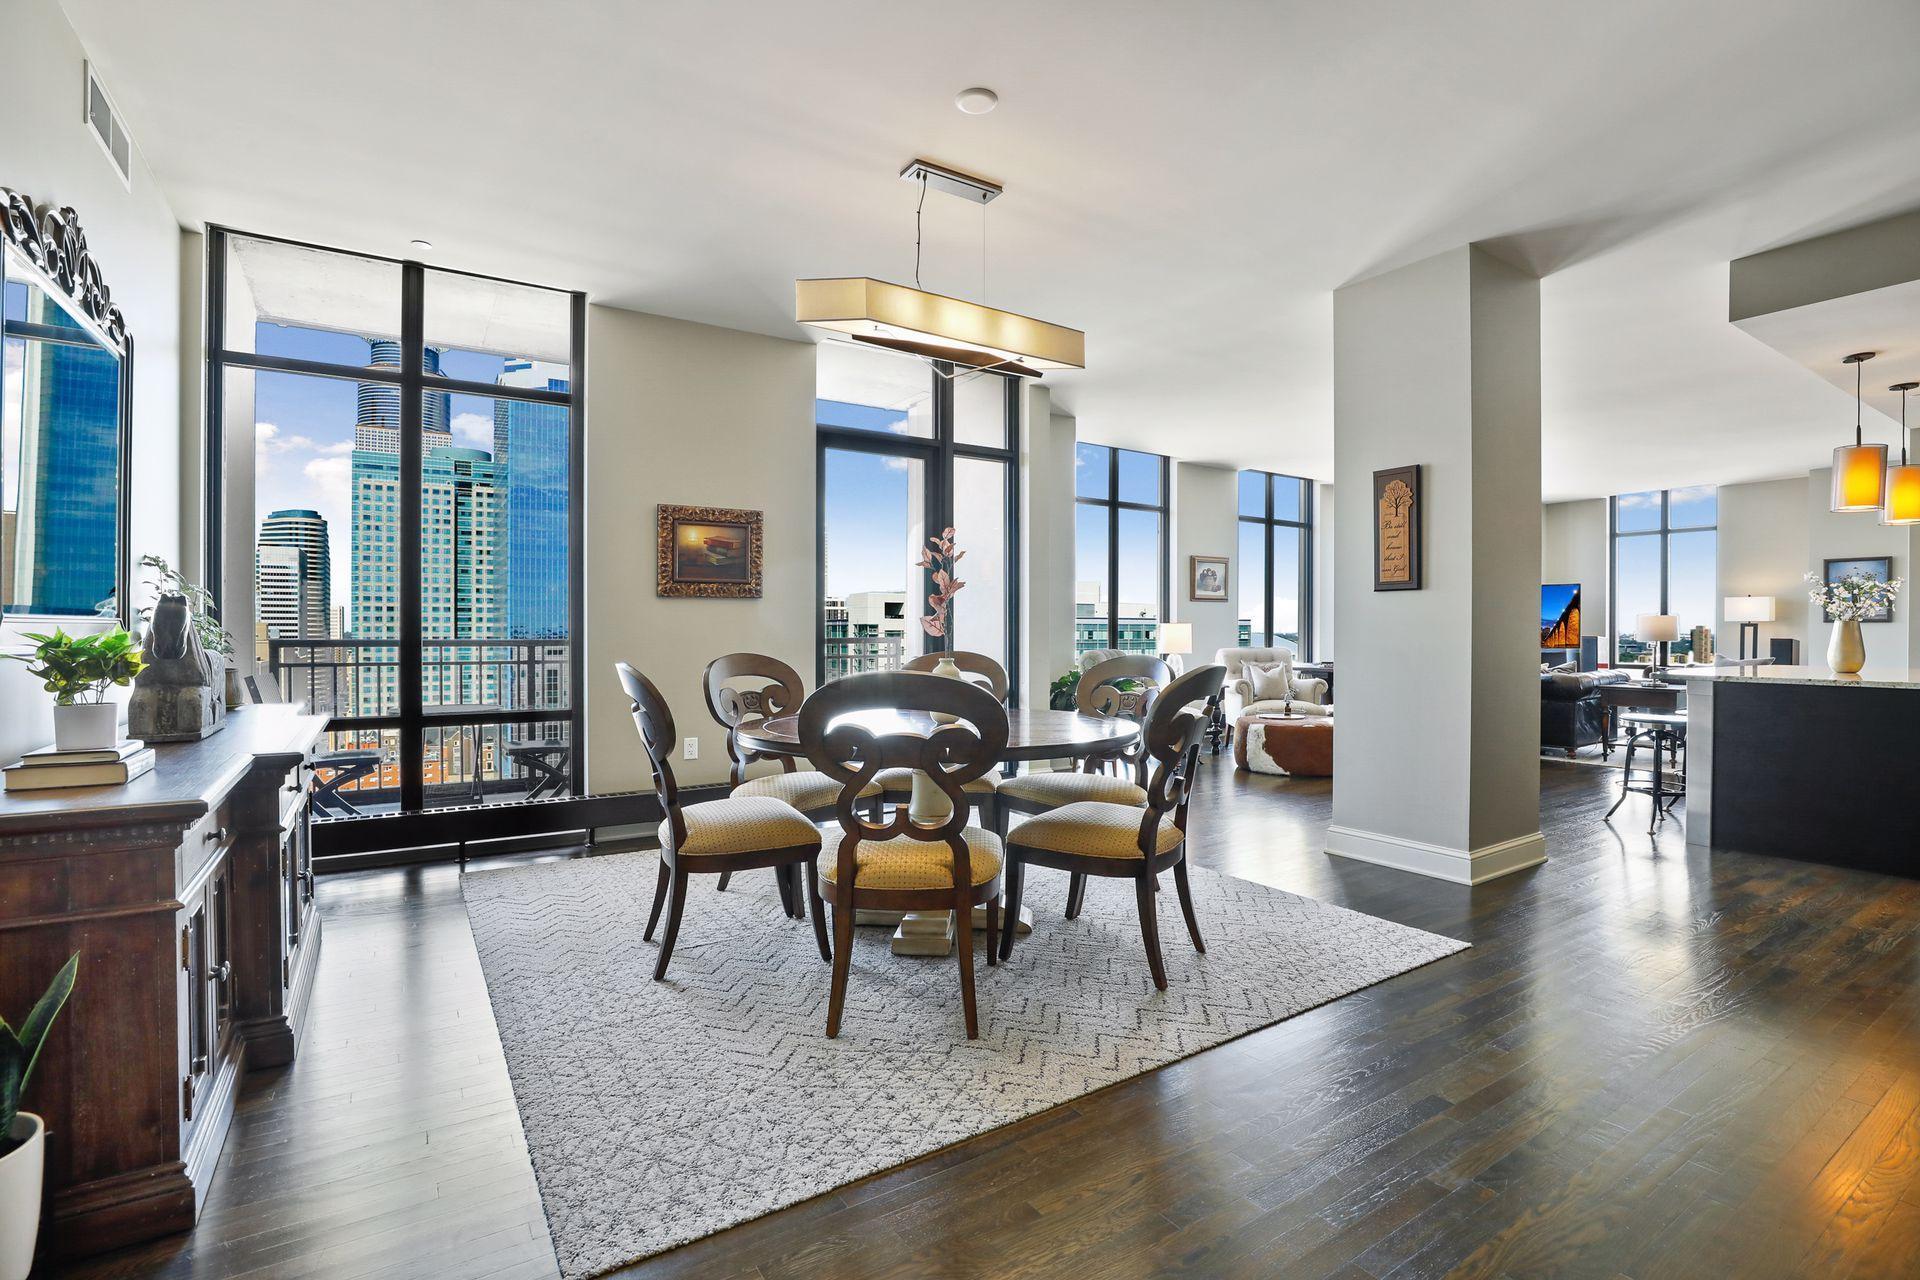 201 S 11th Street #2020 Property Photo - Minneapolis, MN real estate listing